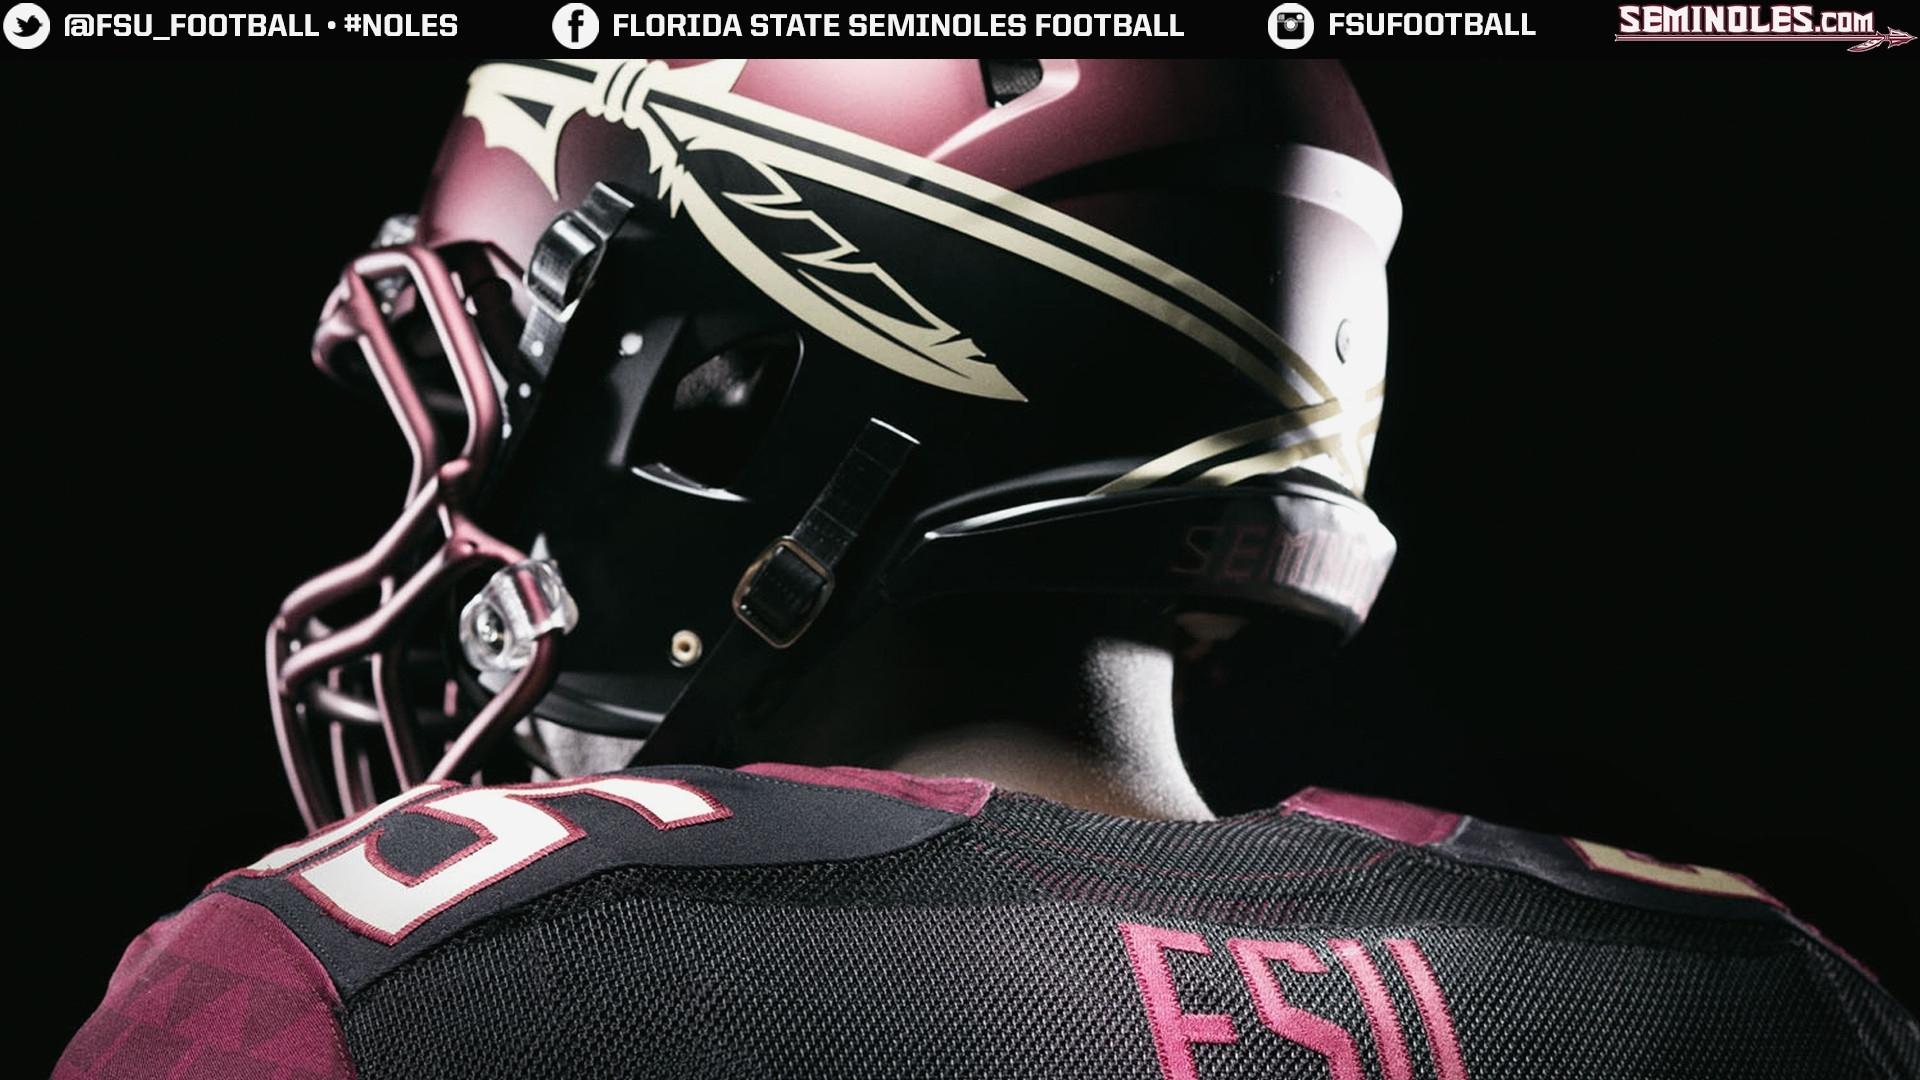 florida state seminoles football wallpaper - free download images